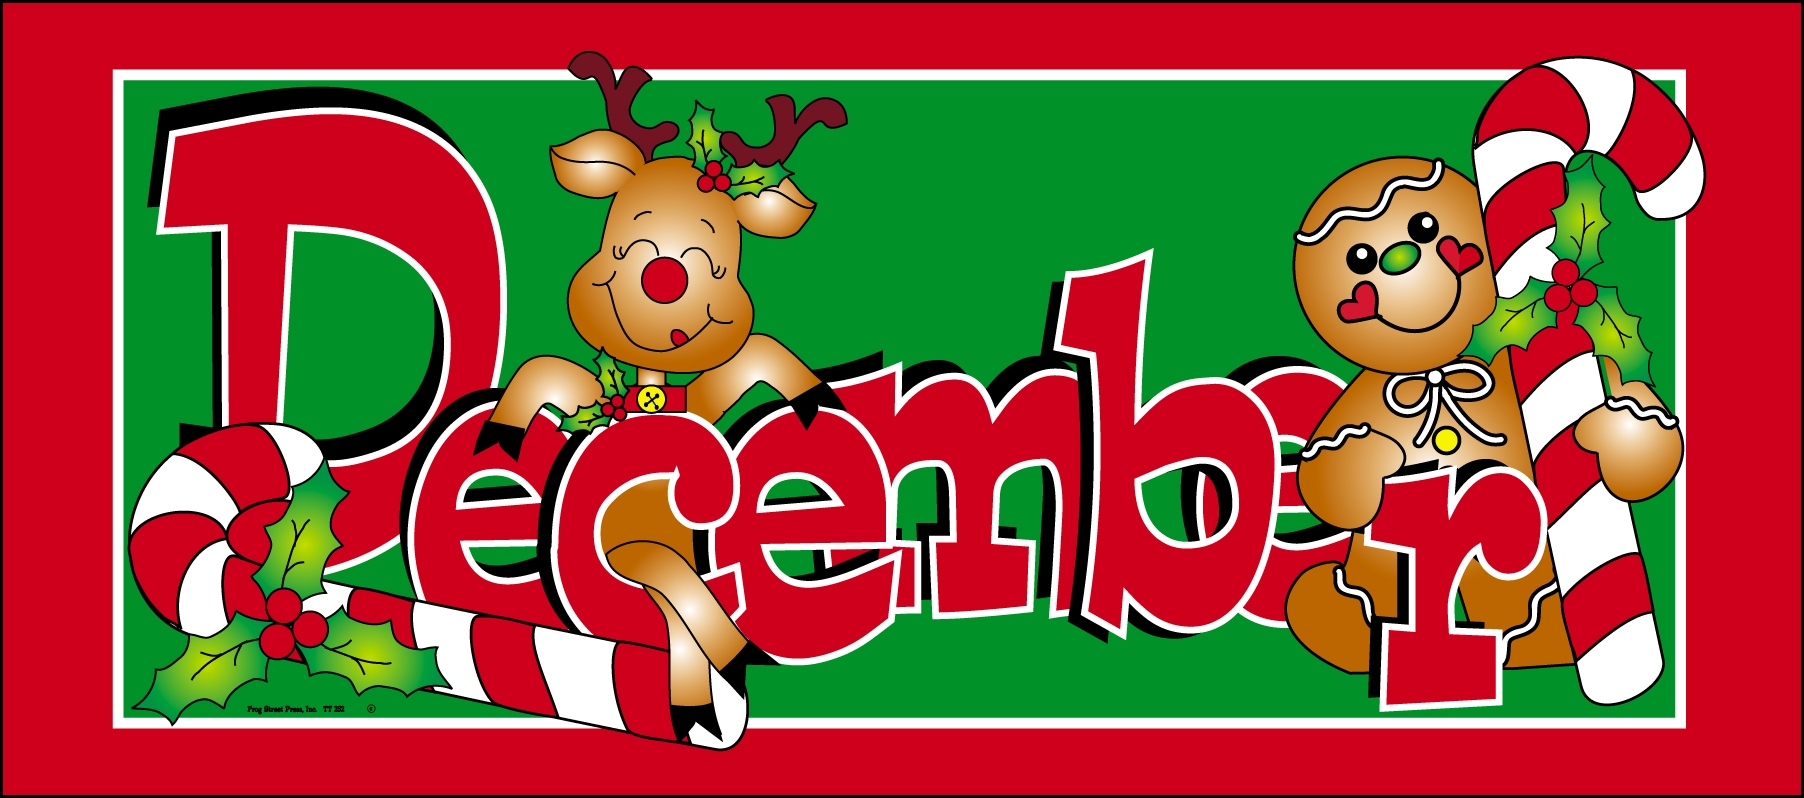 December clipart december newsletter. Free download clip art